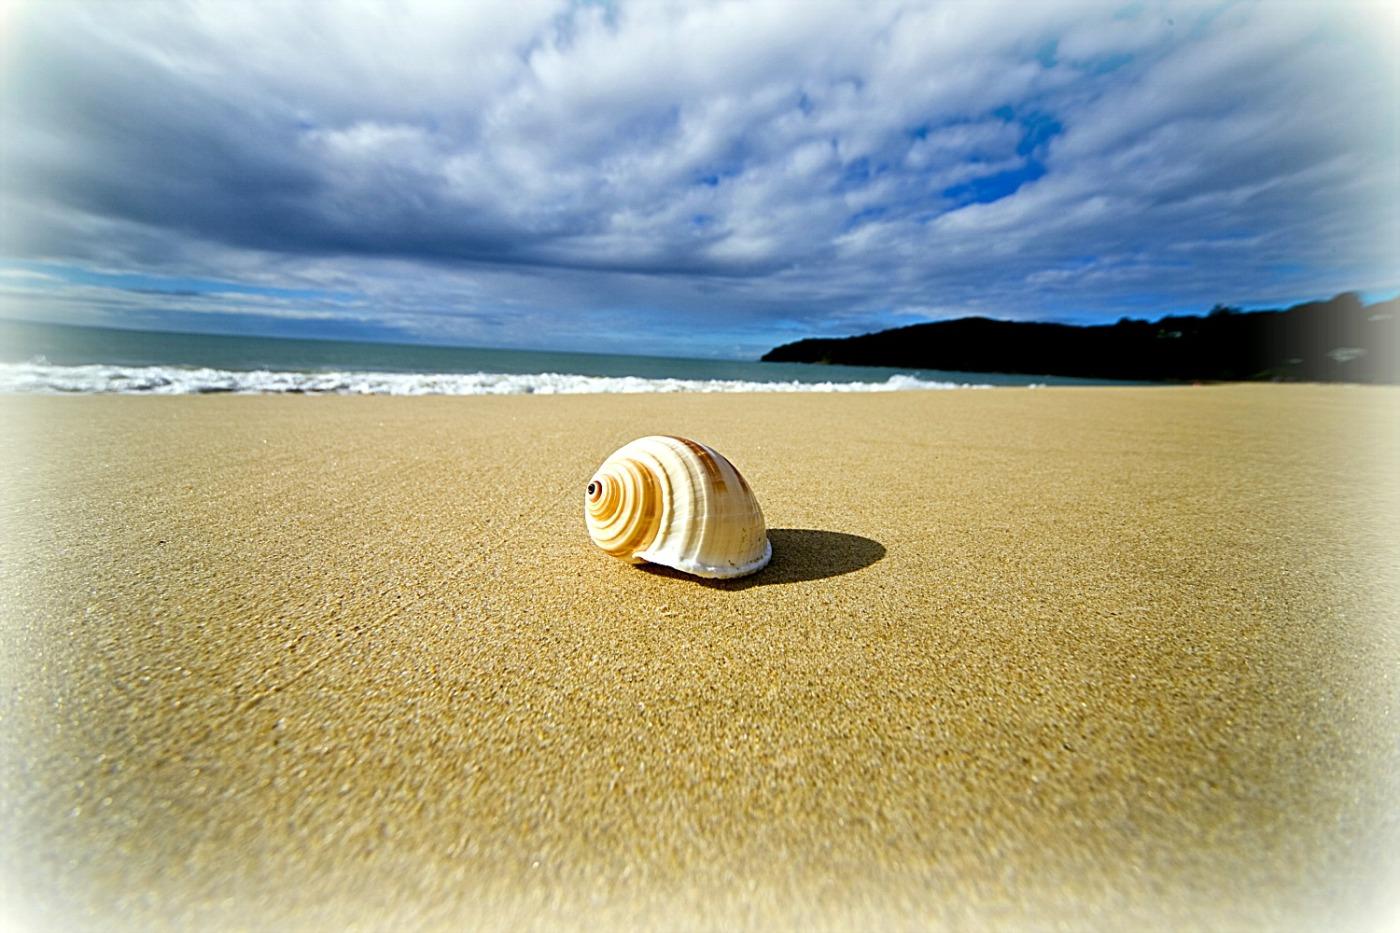 1-spiral-shell-on-beach-queensland-australia